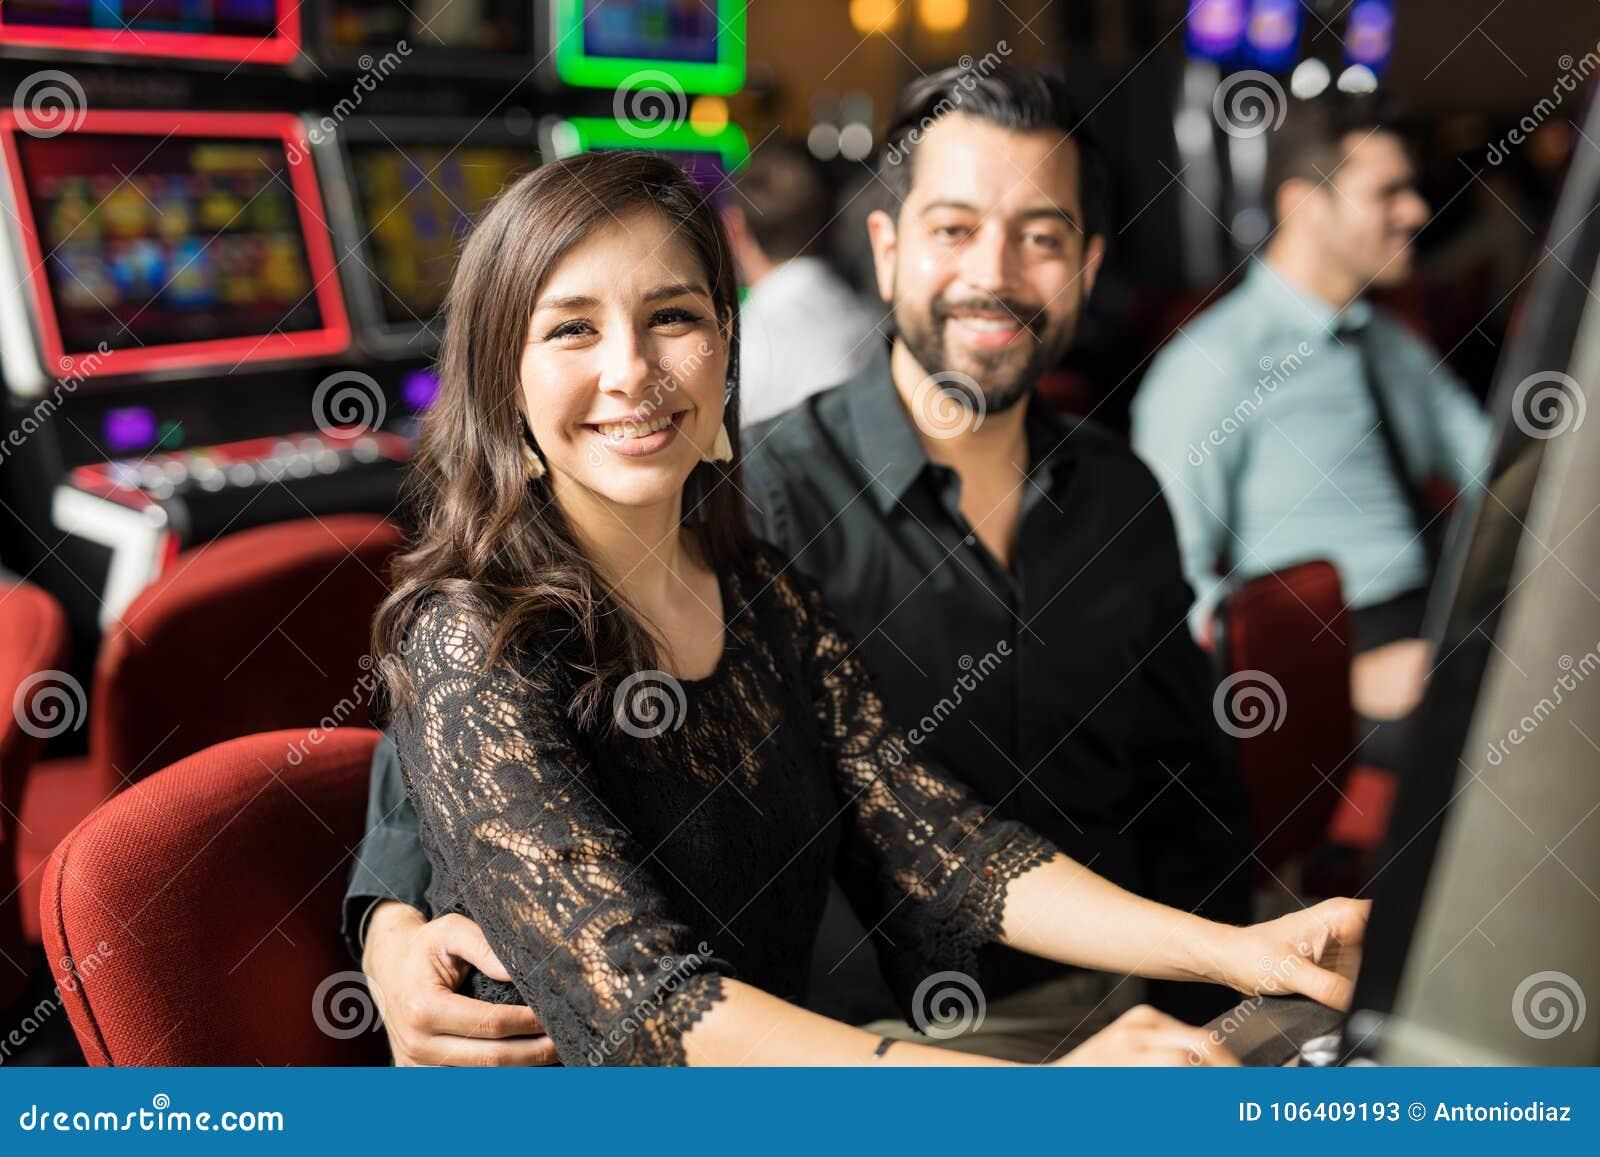 dating casino hvad er det som at danse en virgo mand